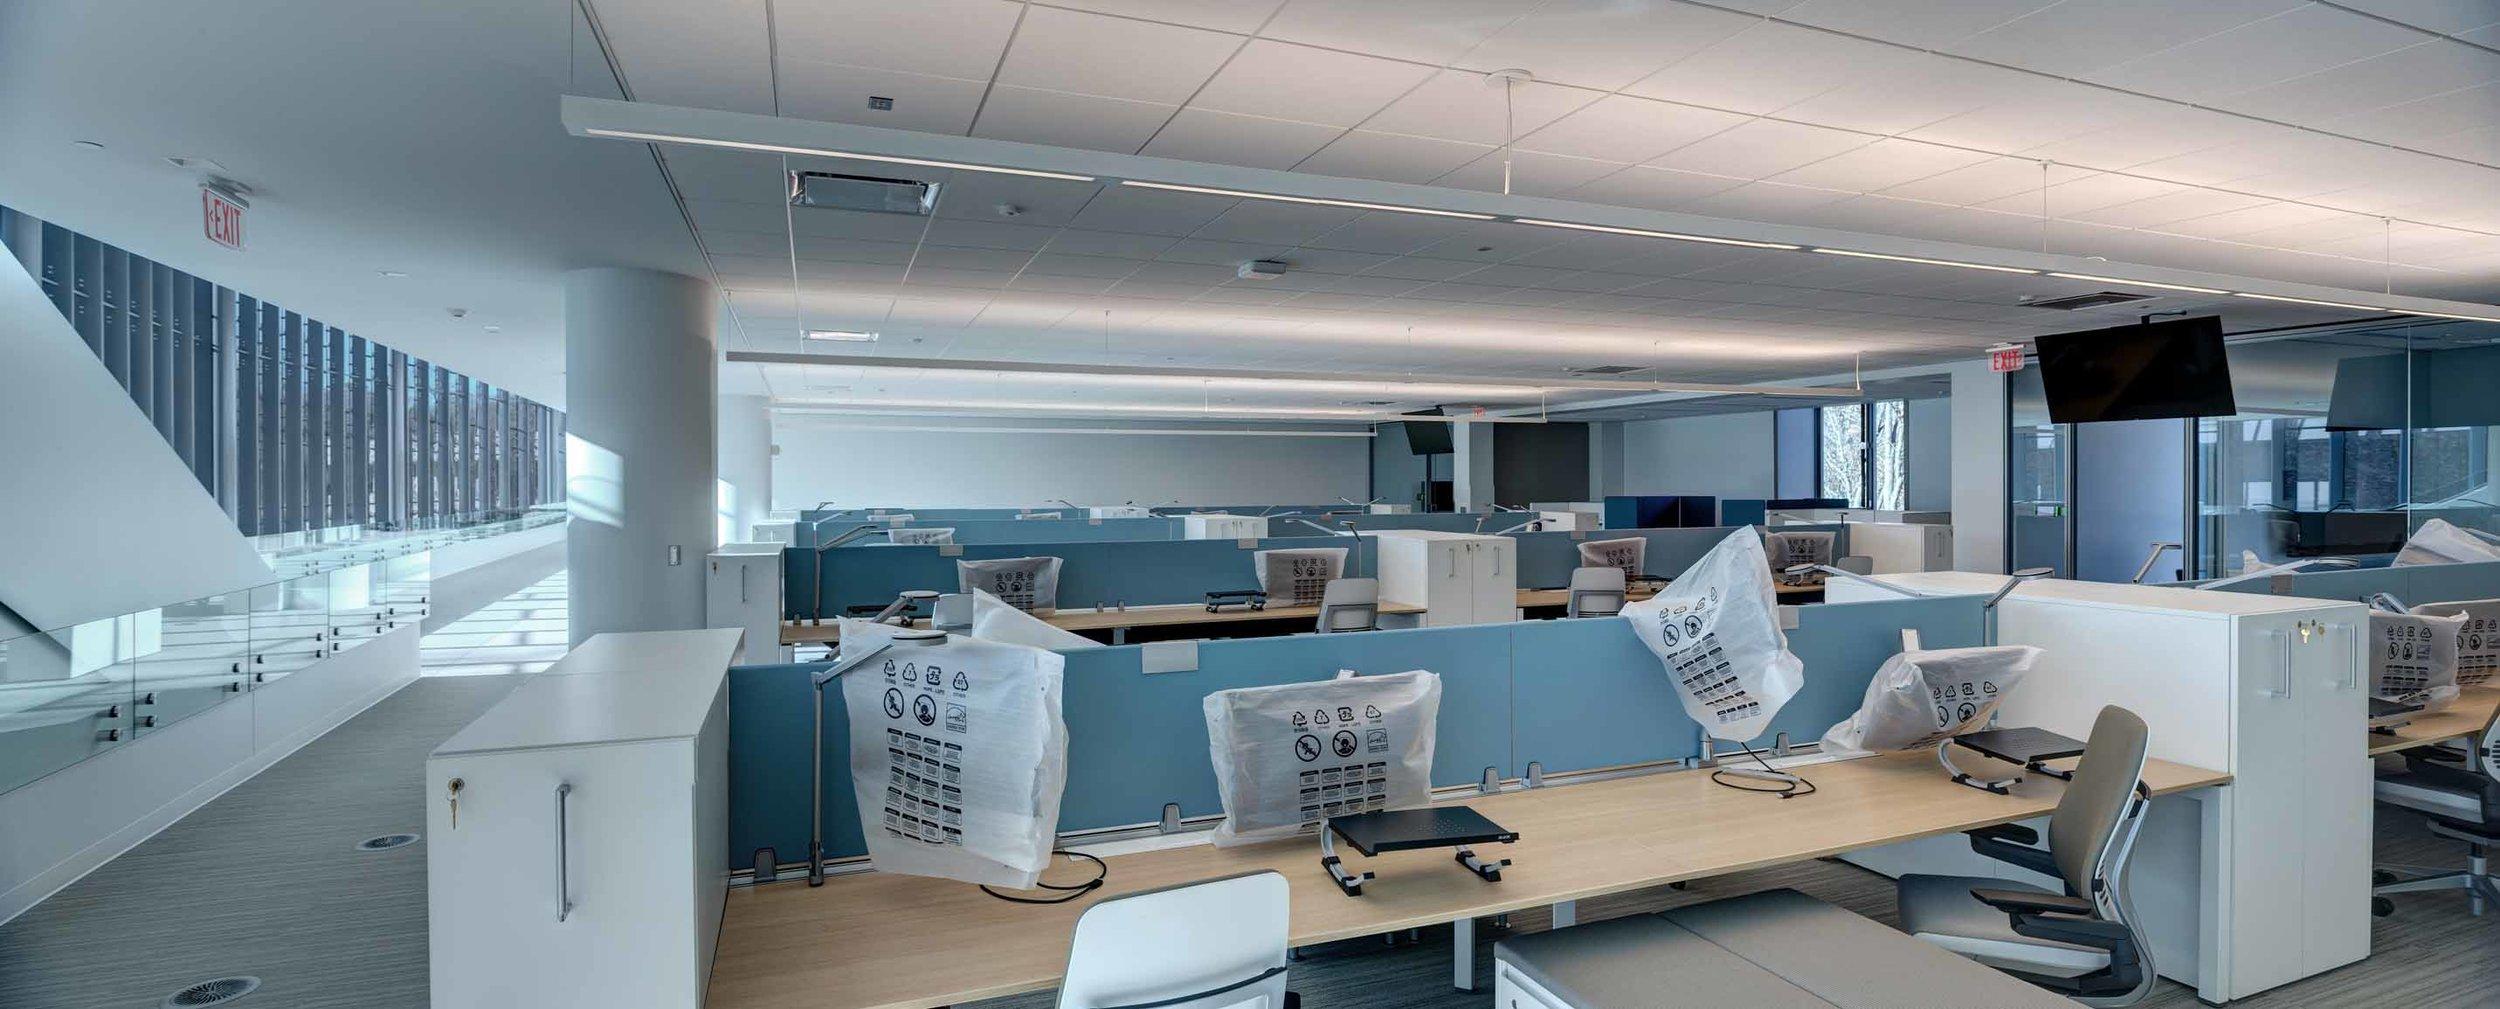 2ndFloor-Offices-10246-ConsumersCreditUnion-QuarterSize[1].jpg